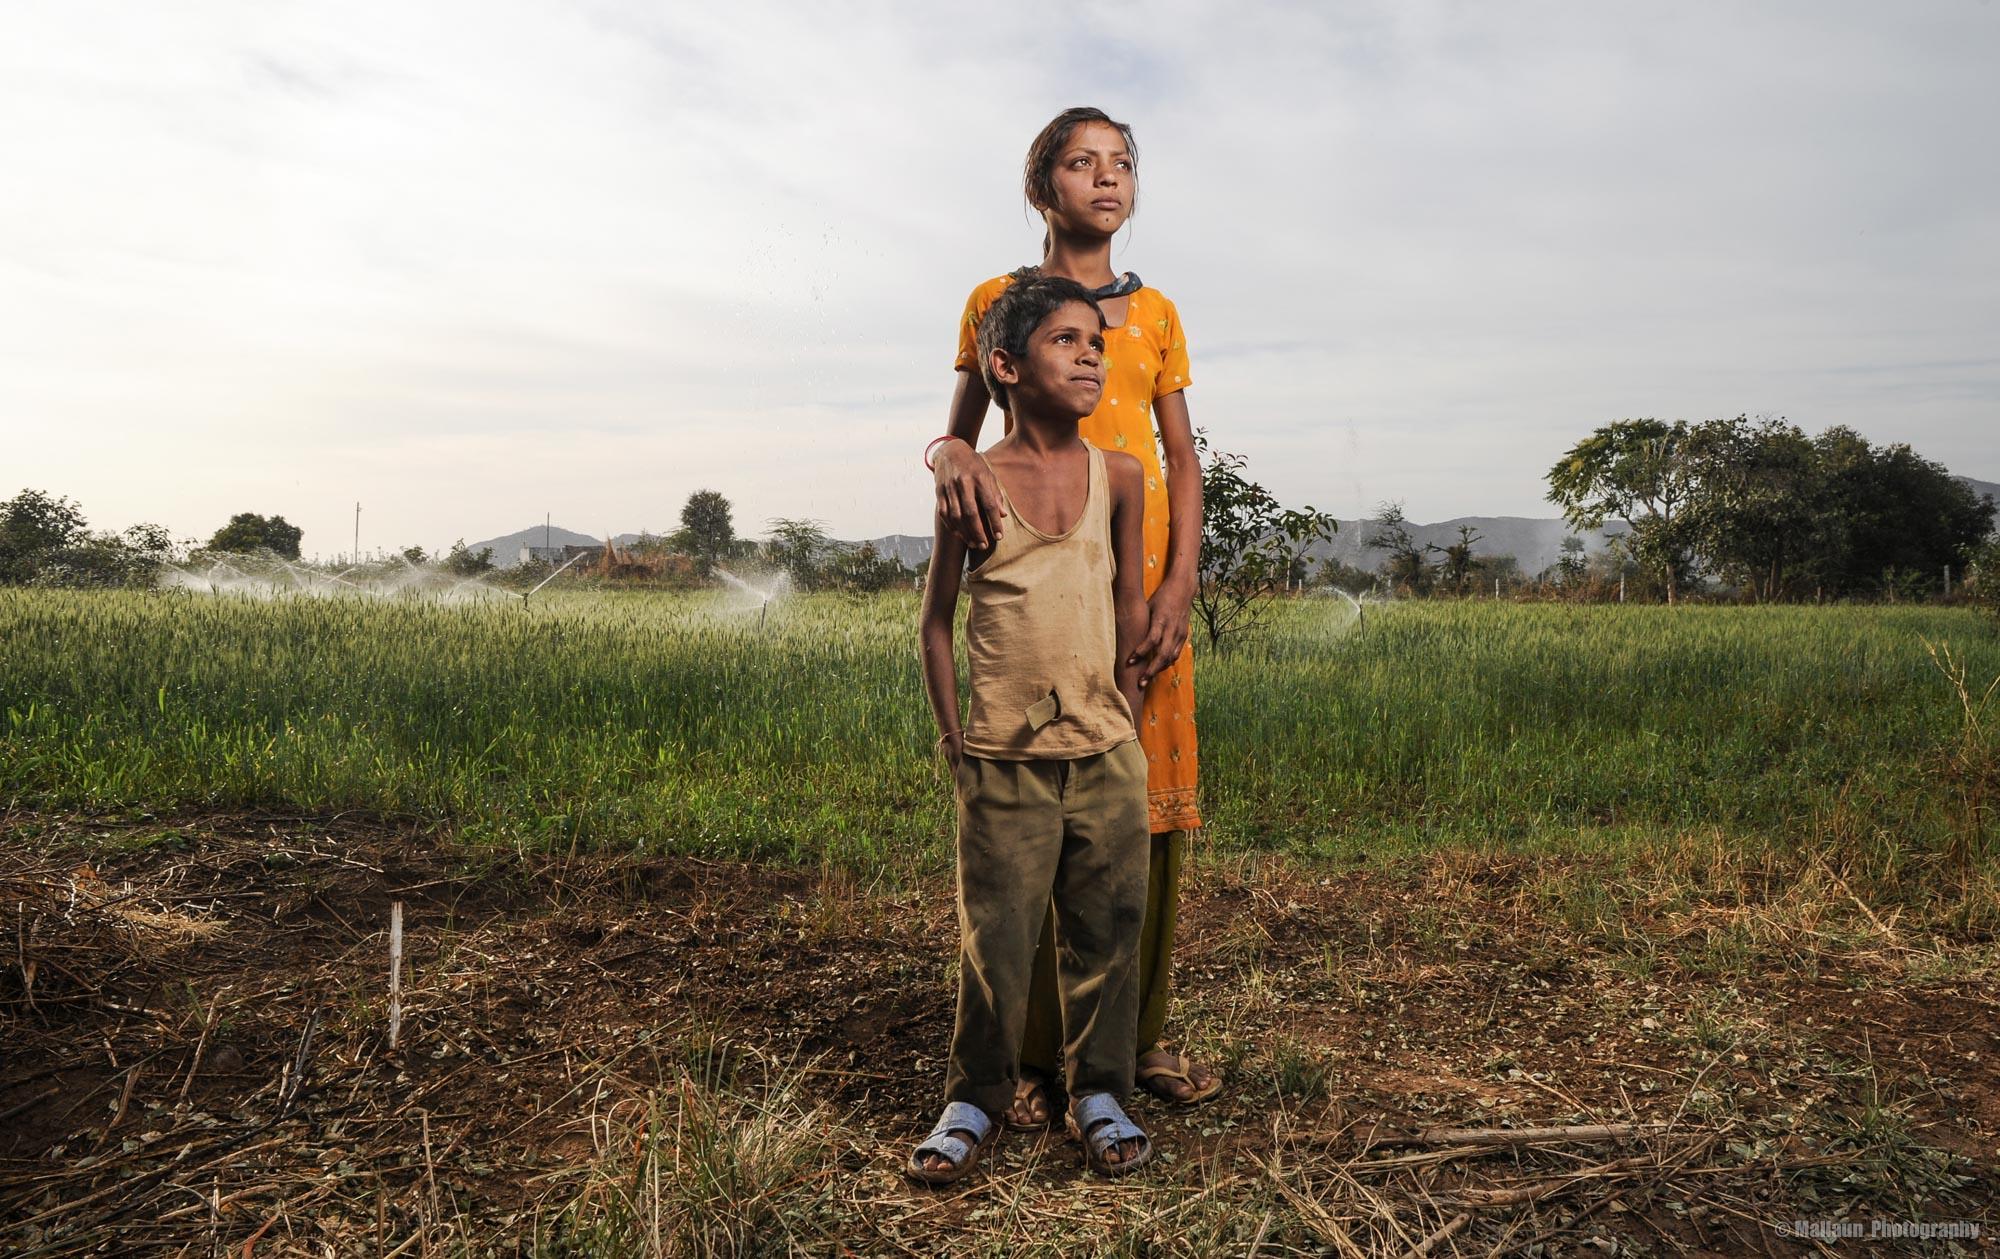 Bauernkinder in Pushkar, Rajasthan Indien © Mallaun Photography